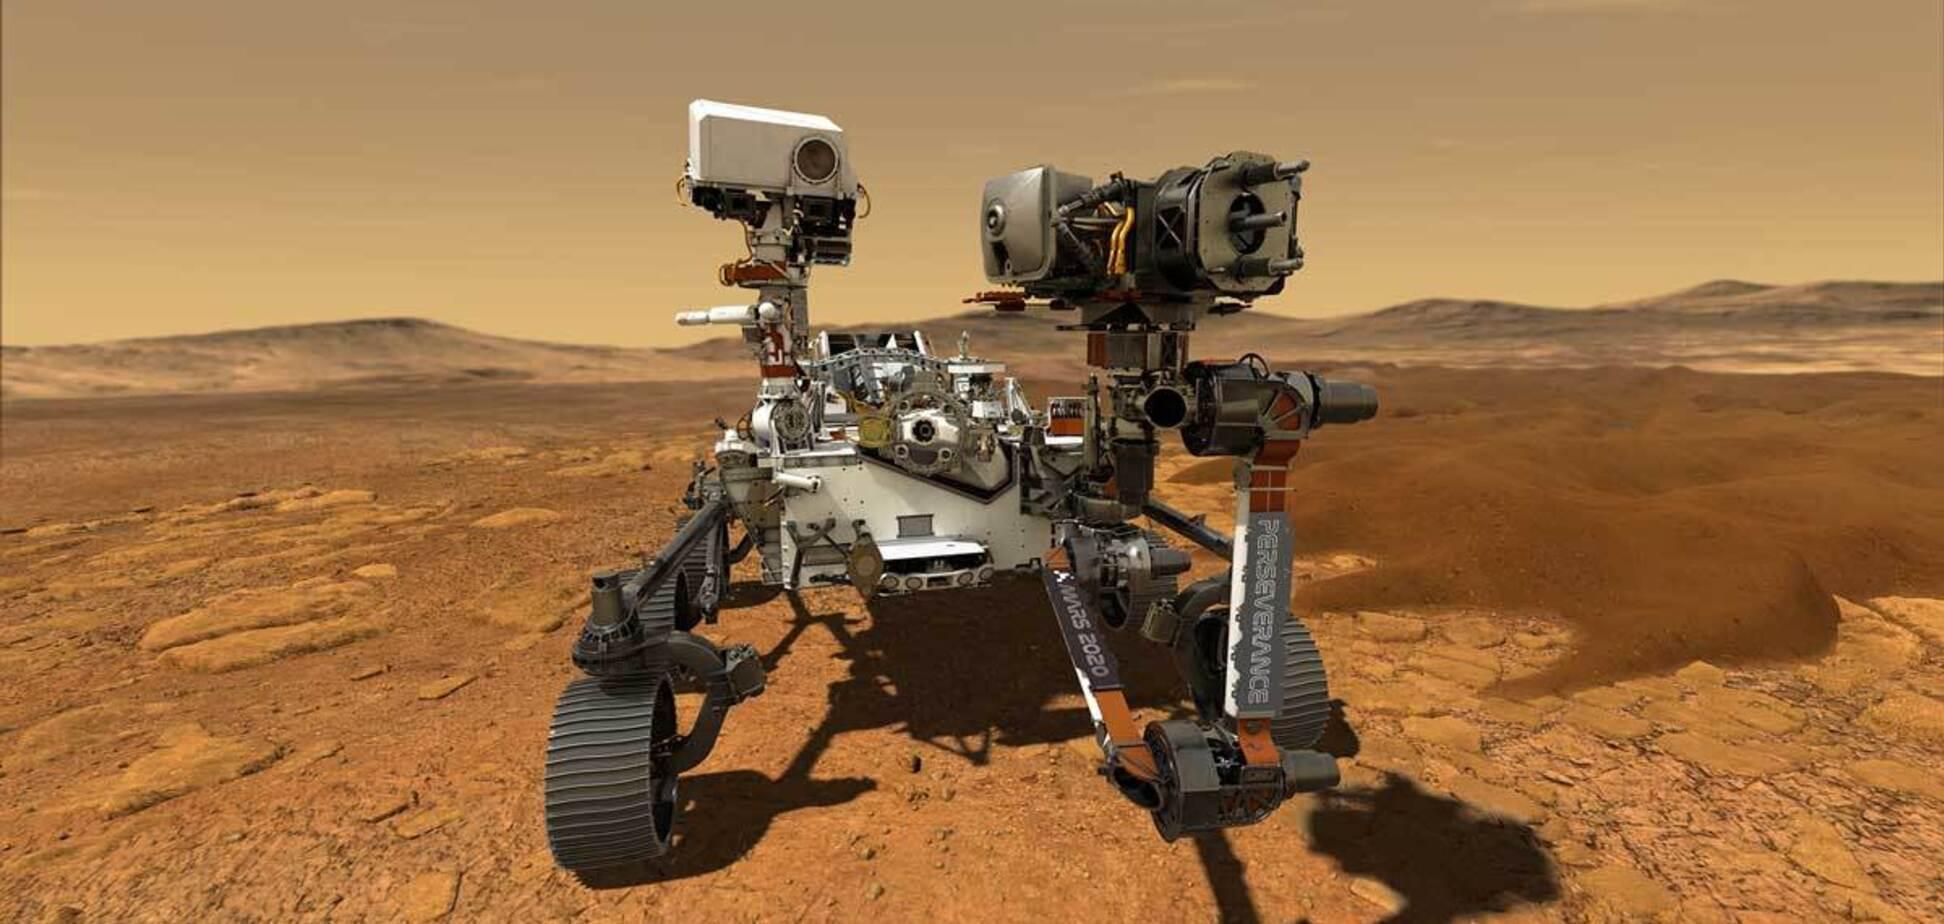 Запись сделана с микрофона на борту марсохода